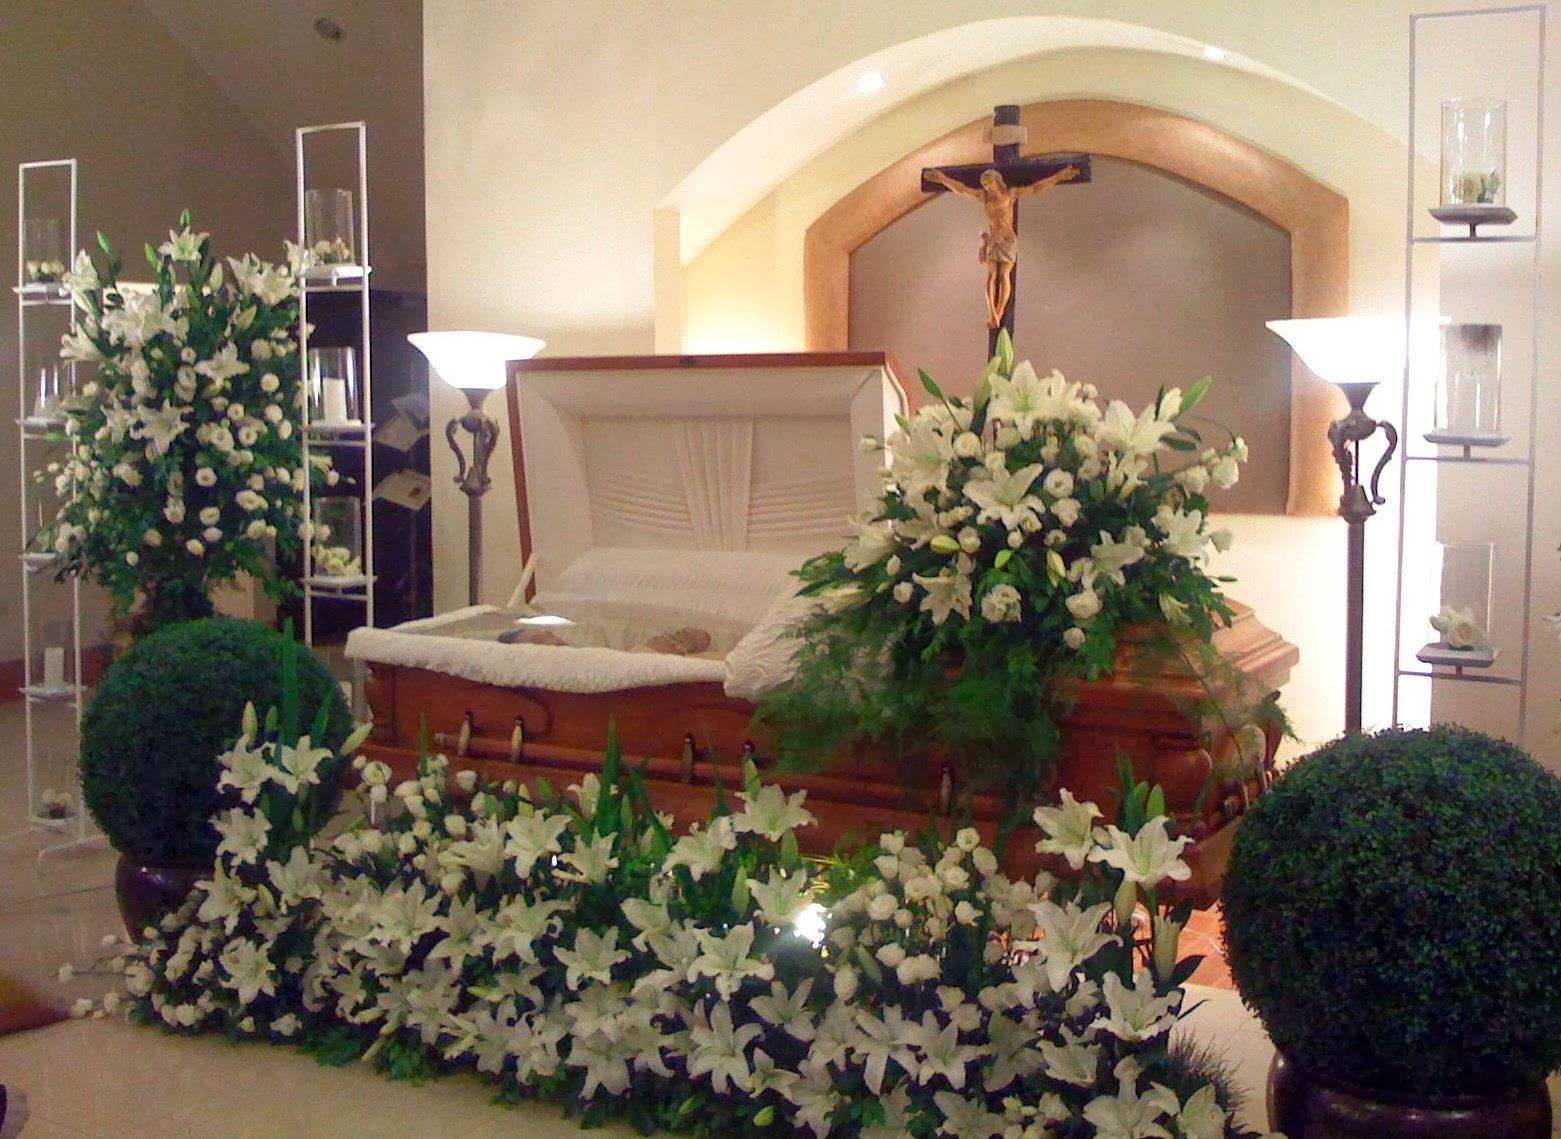 Sympathy Flower Arrangements & Funeral Setup